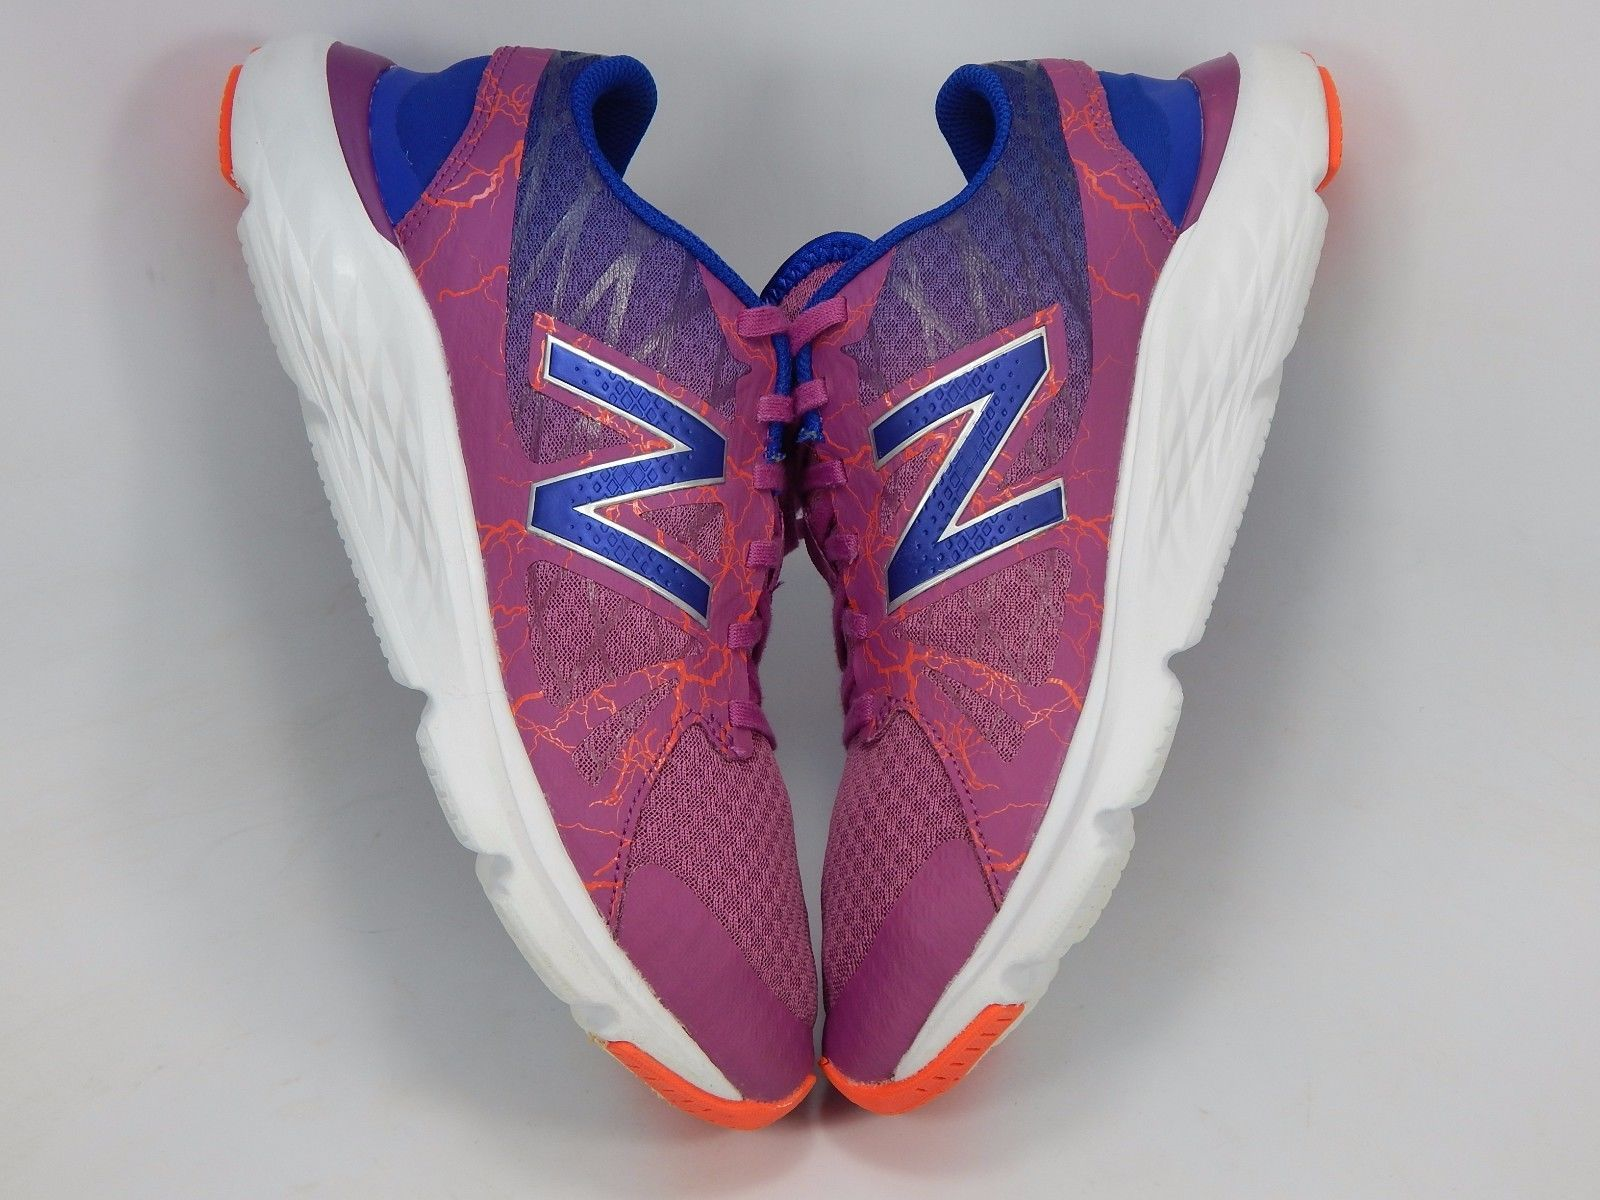 New Balance 690 v4 Women's Running Shoes Size US 8.5 M (B) EU 40 Blue pink